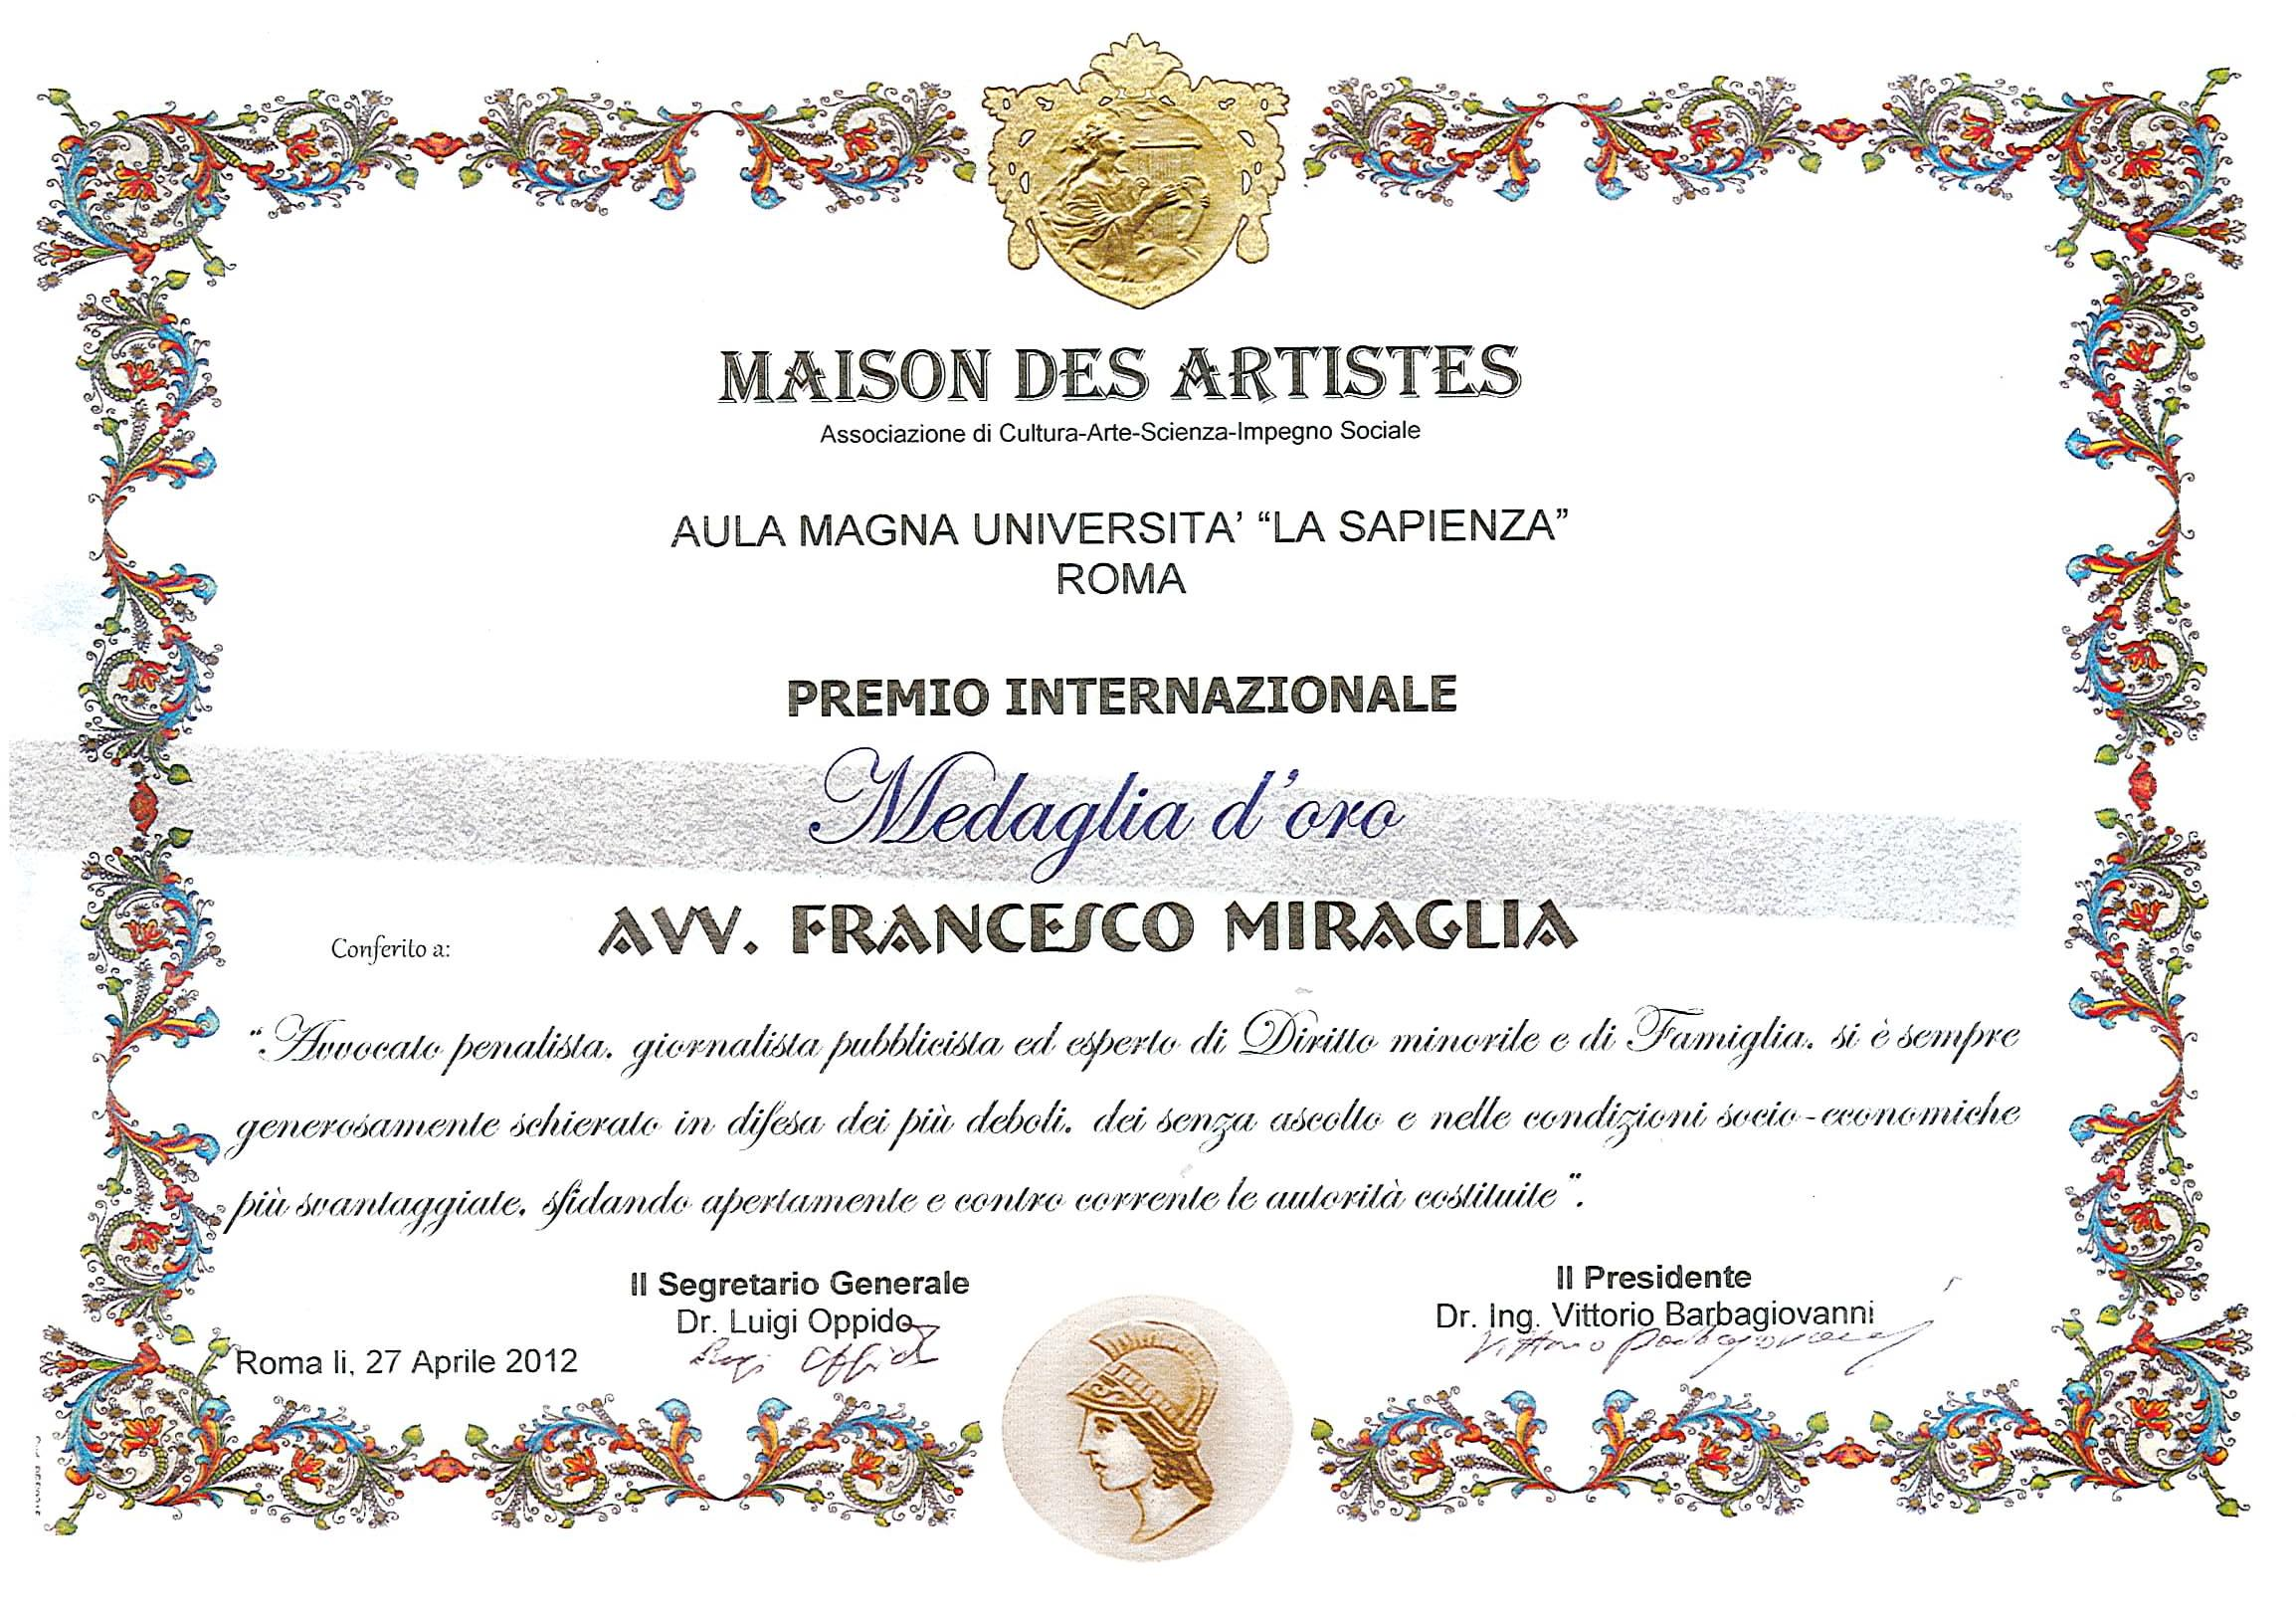 Maison des artistes premio ai meritevoli della crescita for Agessa maison des artistes